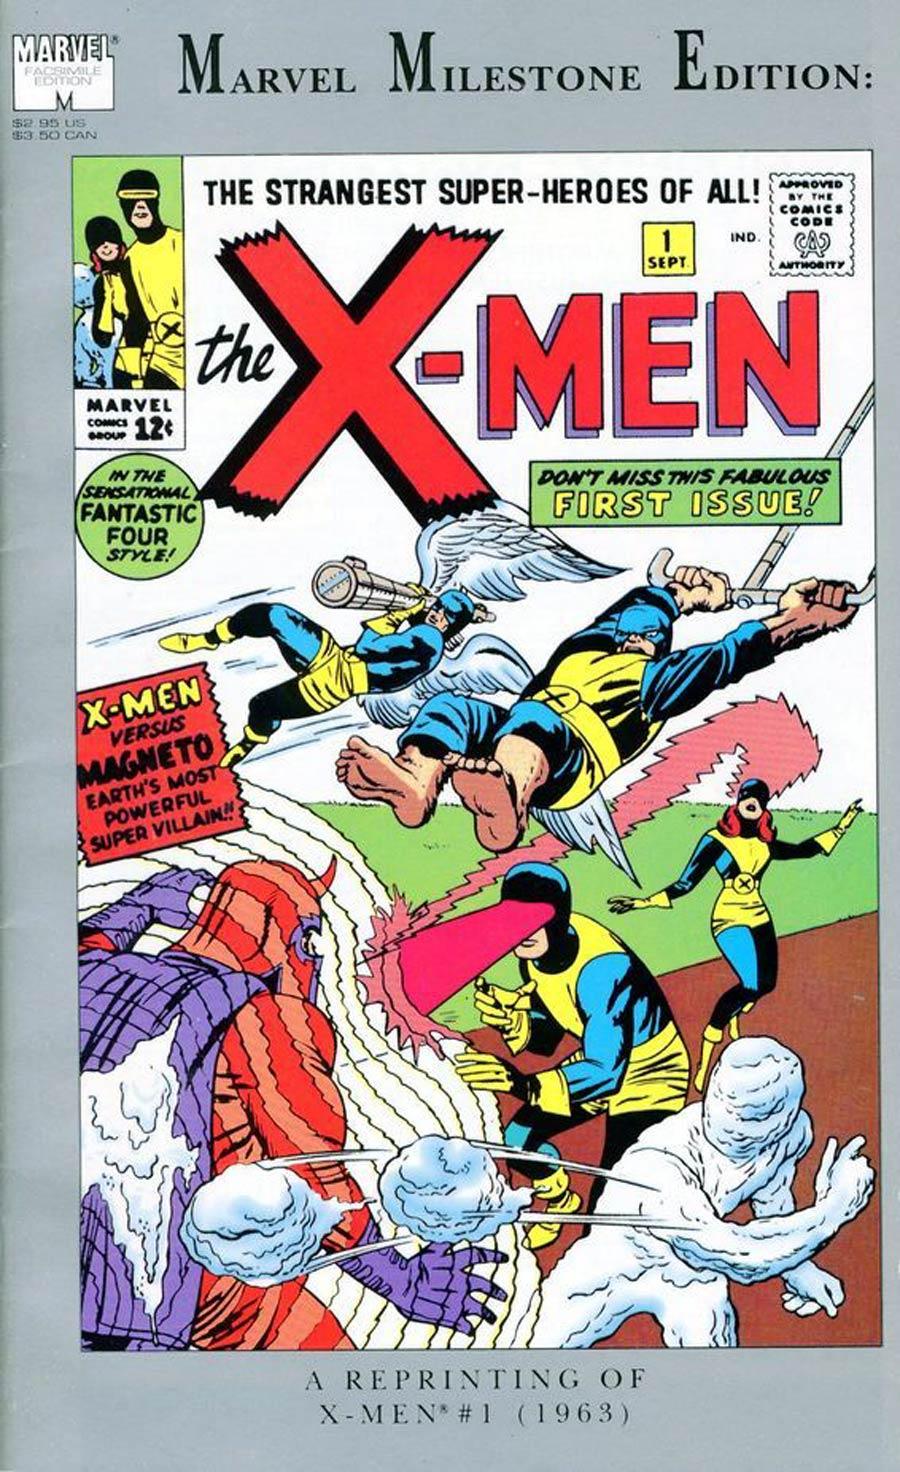 Marvel Milestone Edition X-Men #1